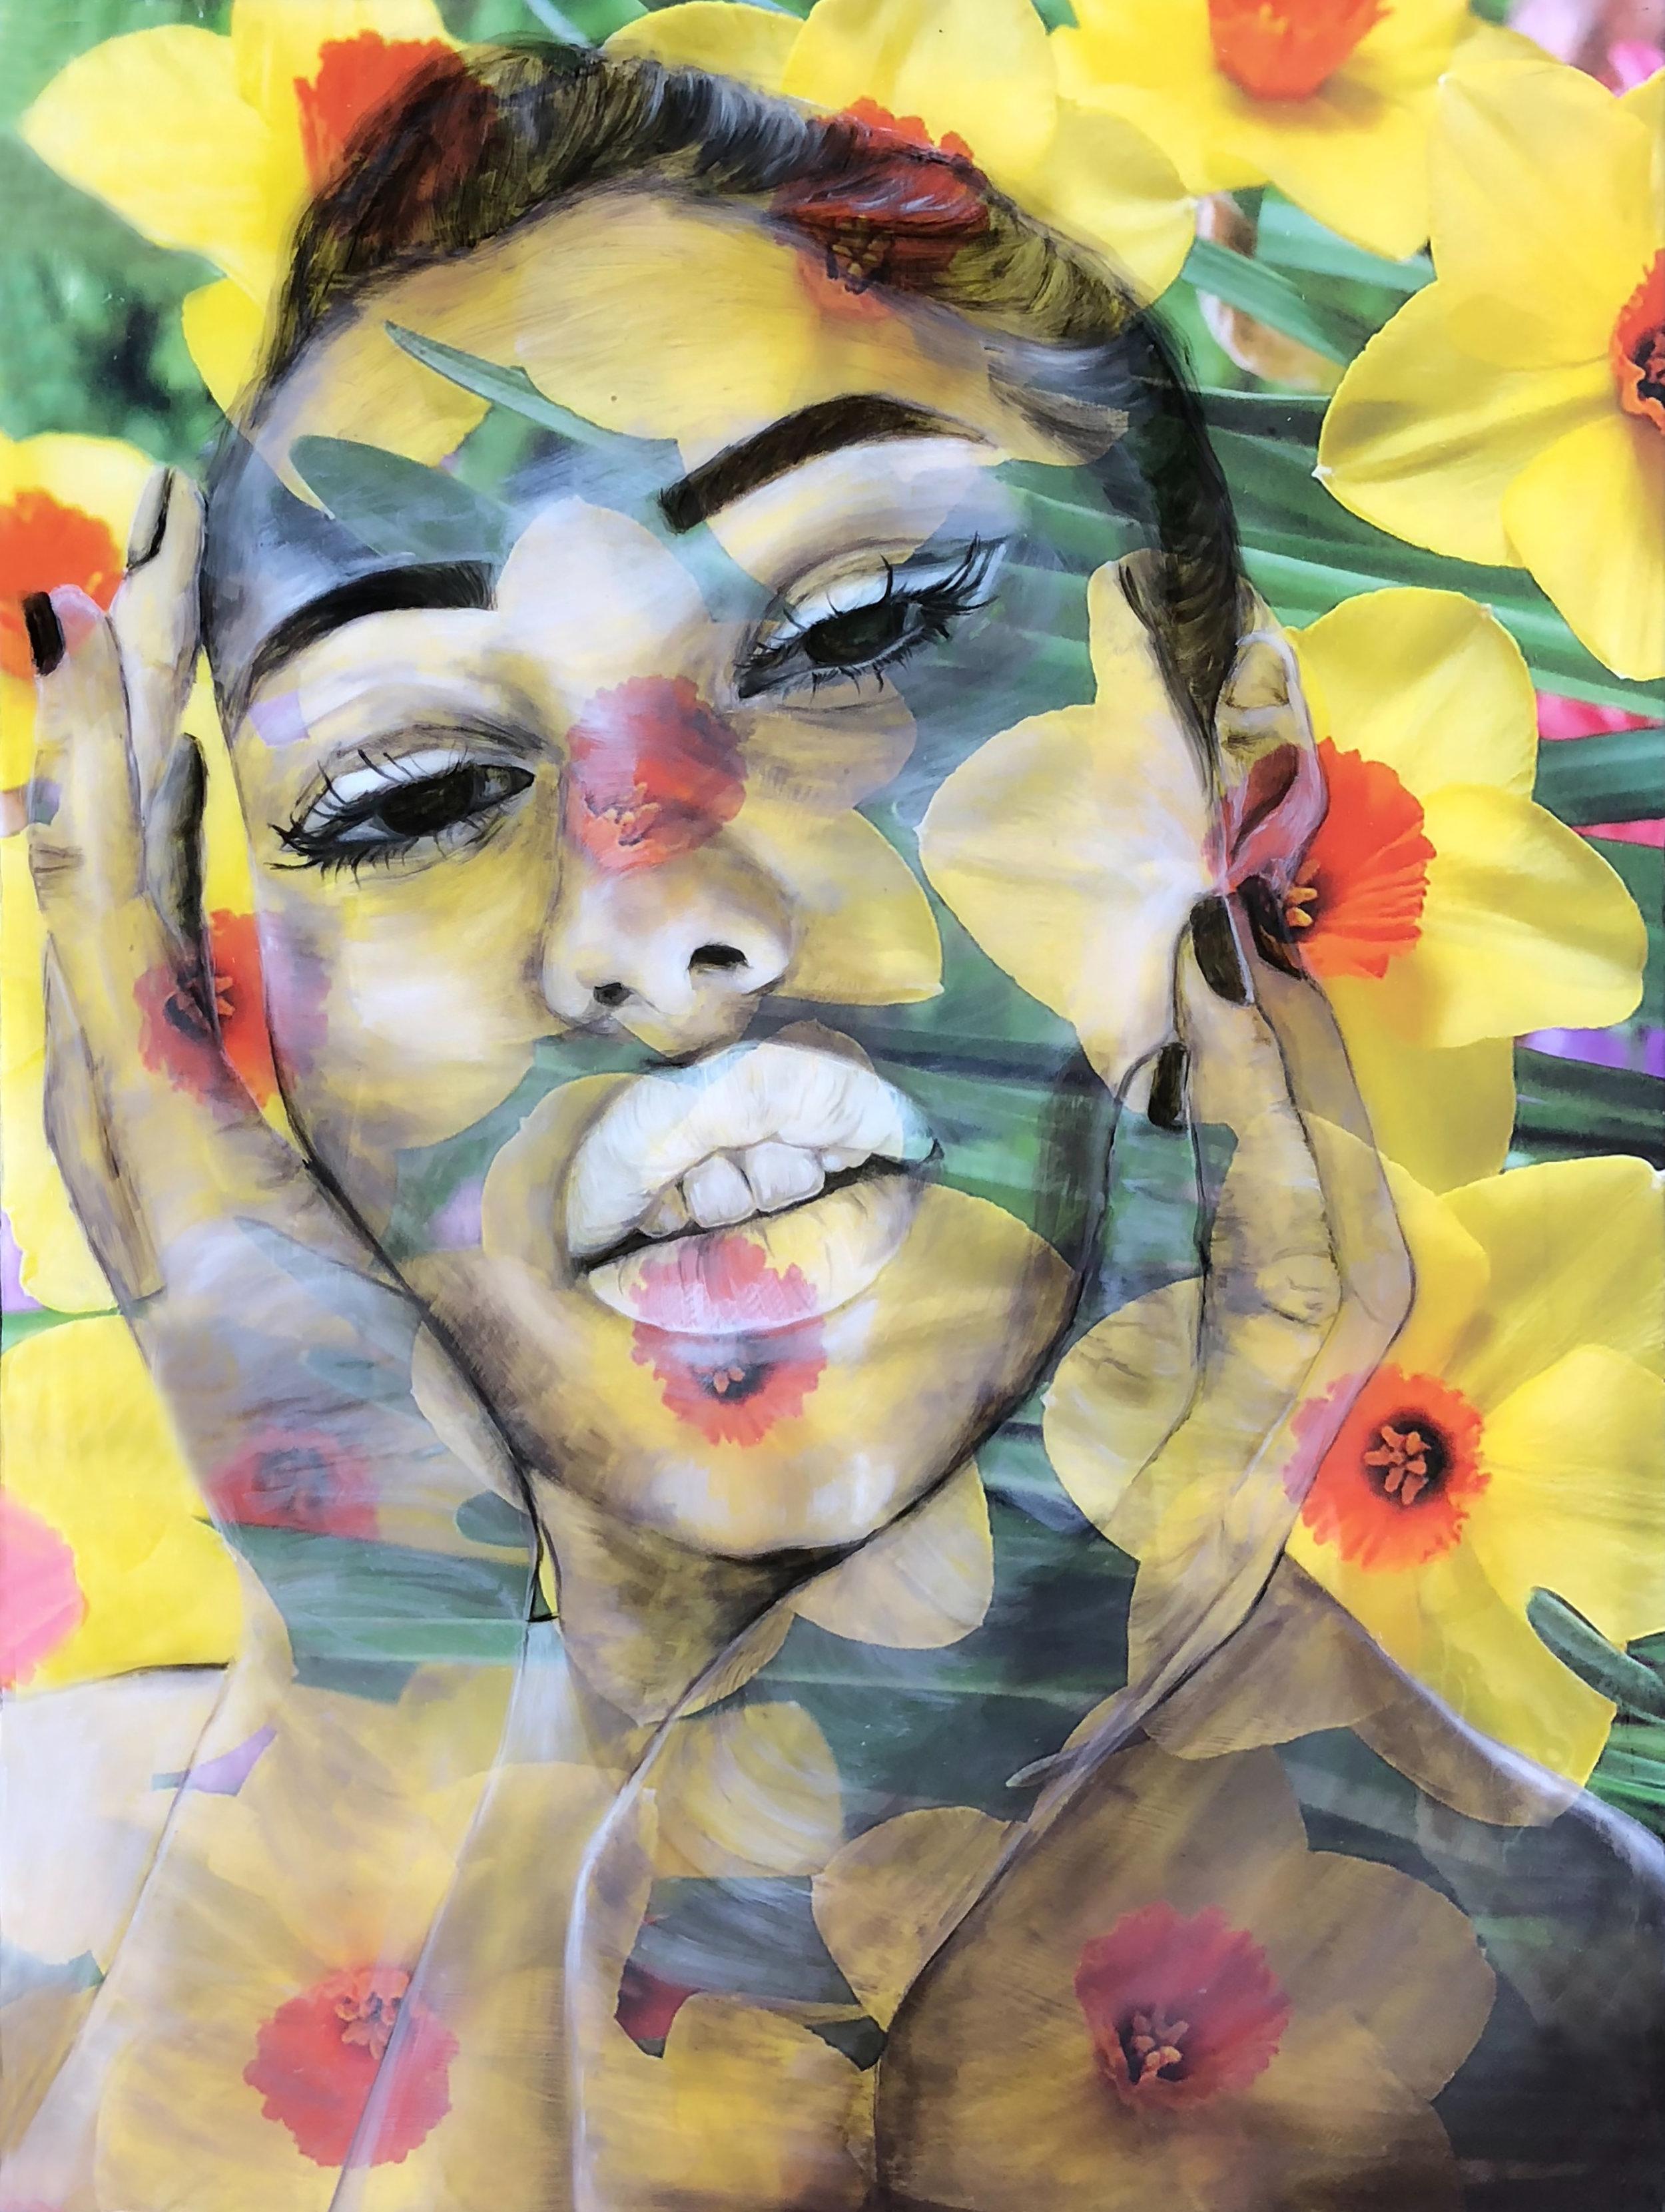 Daffodil, Rebirth and New Beginnings